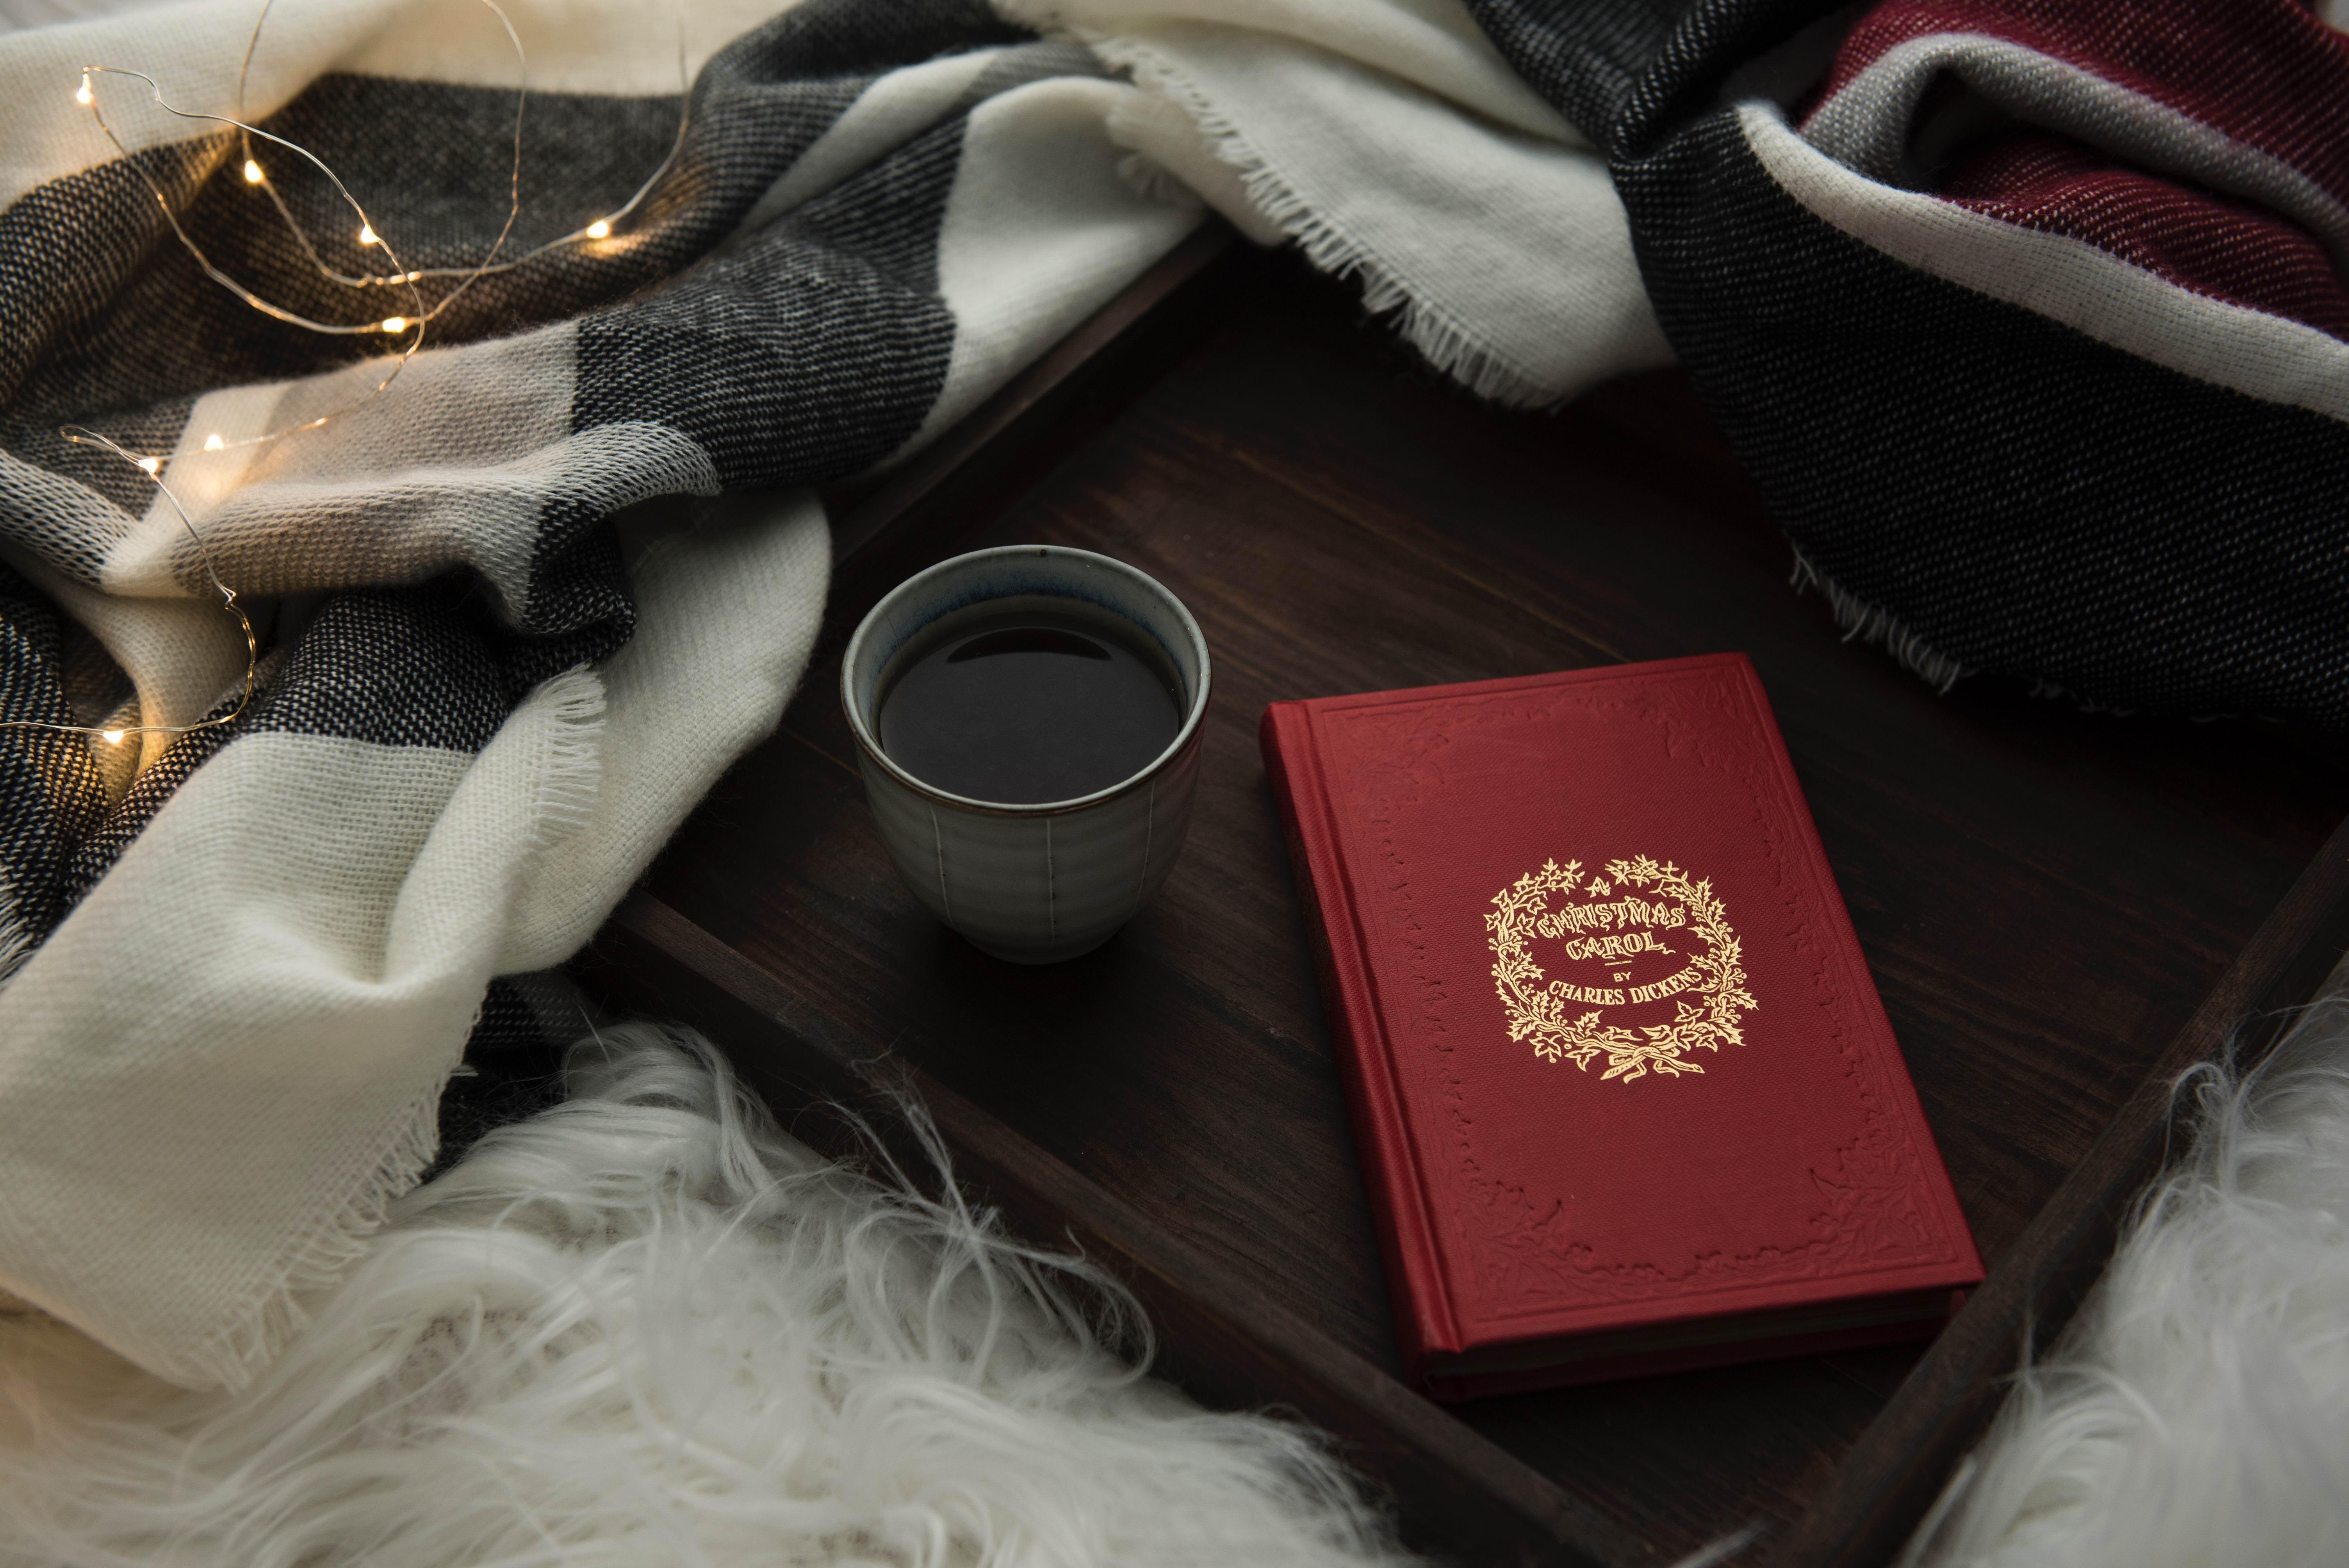 CHRISTMAS CAROL BOOK & COFFEE - Photo by Joanna Kosinska on Unsplash